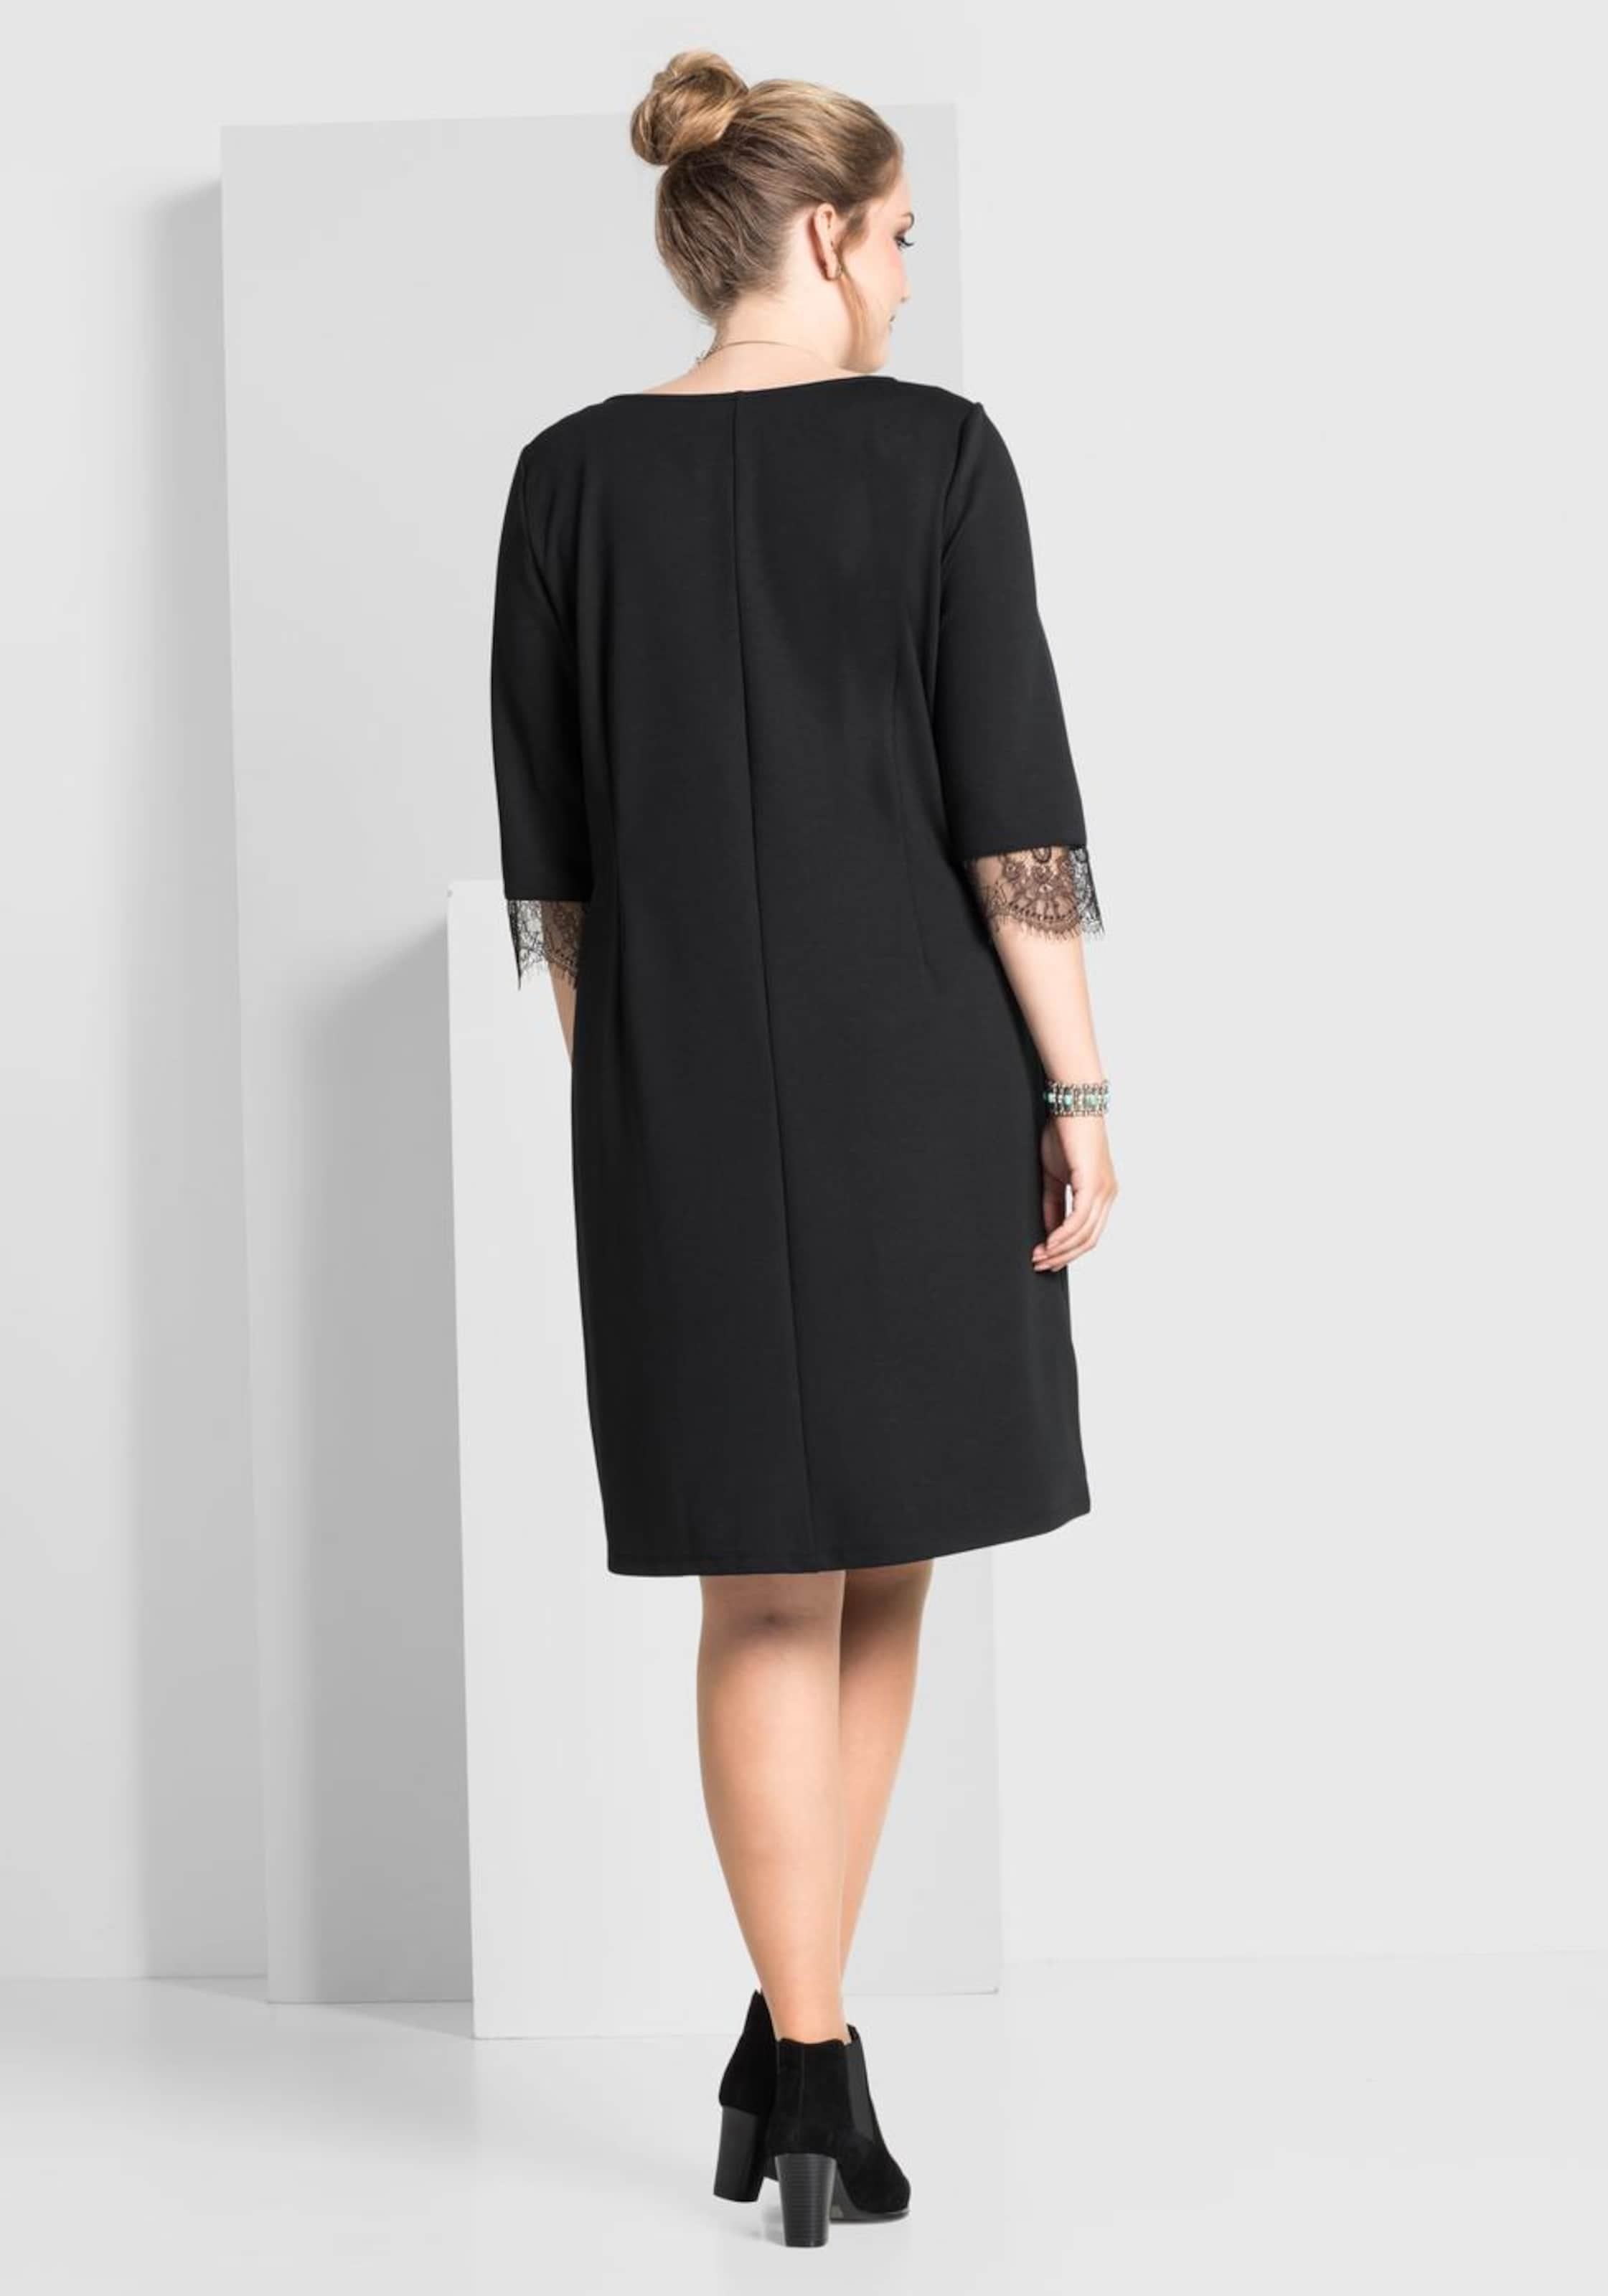 Schwarz Sheego In Abendkleid In Abendkleid Style Style Sheego OvNnm0w8